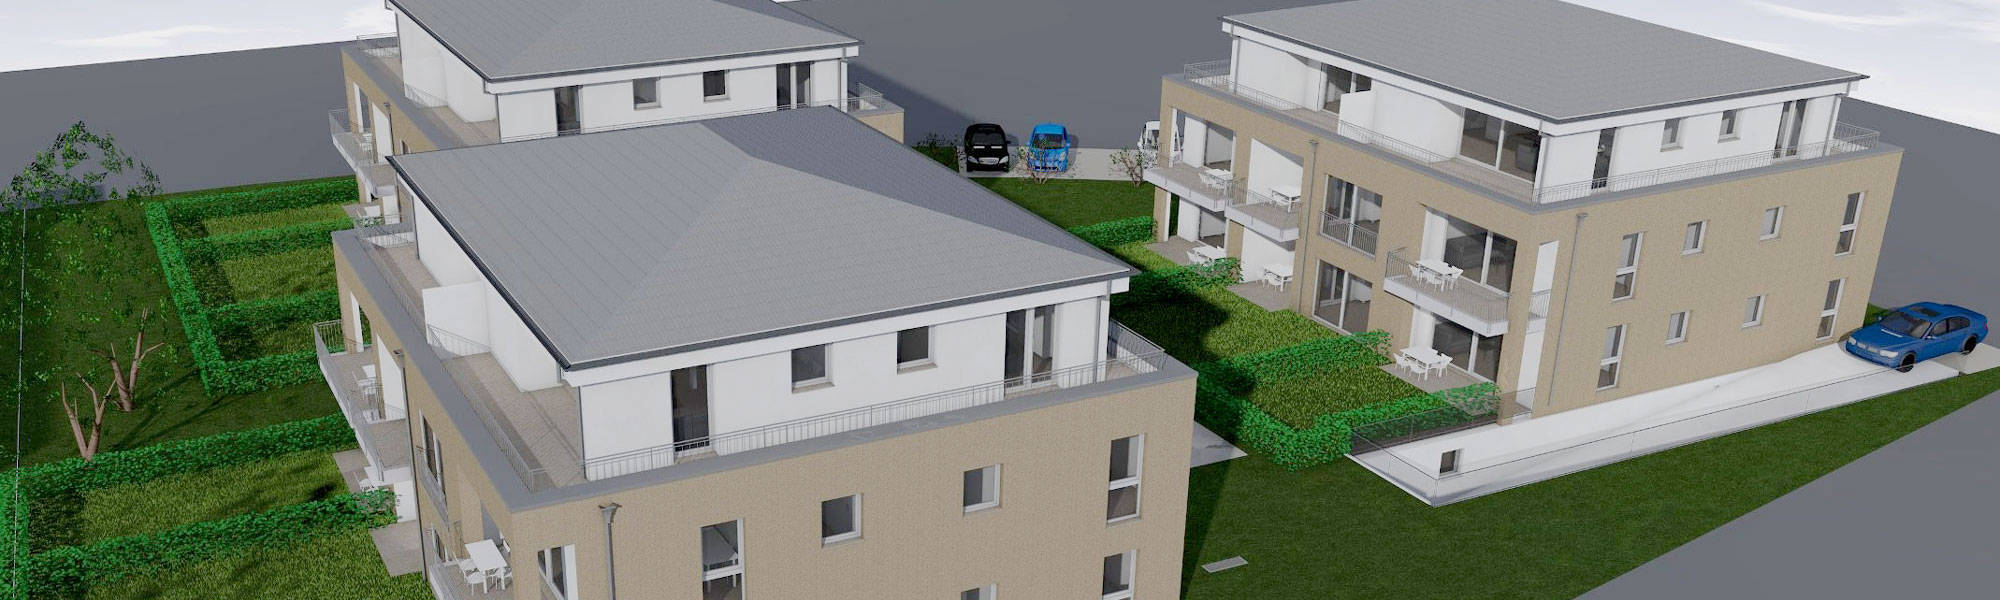 Bauunternehmen Viersen bauunternehmen ruetten brendgen gmbh